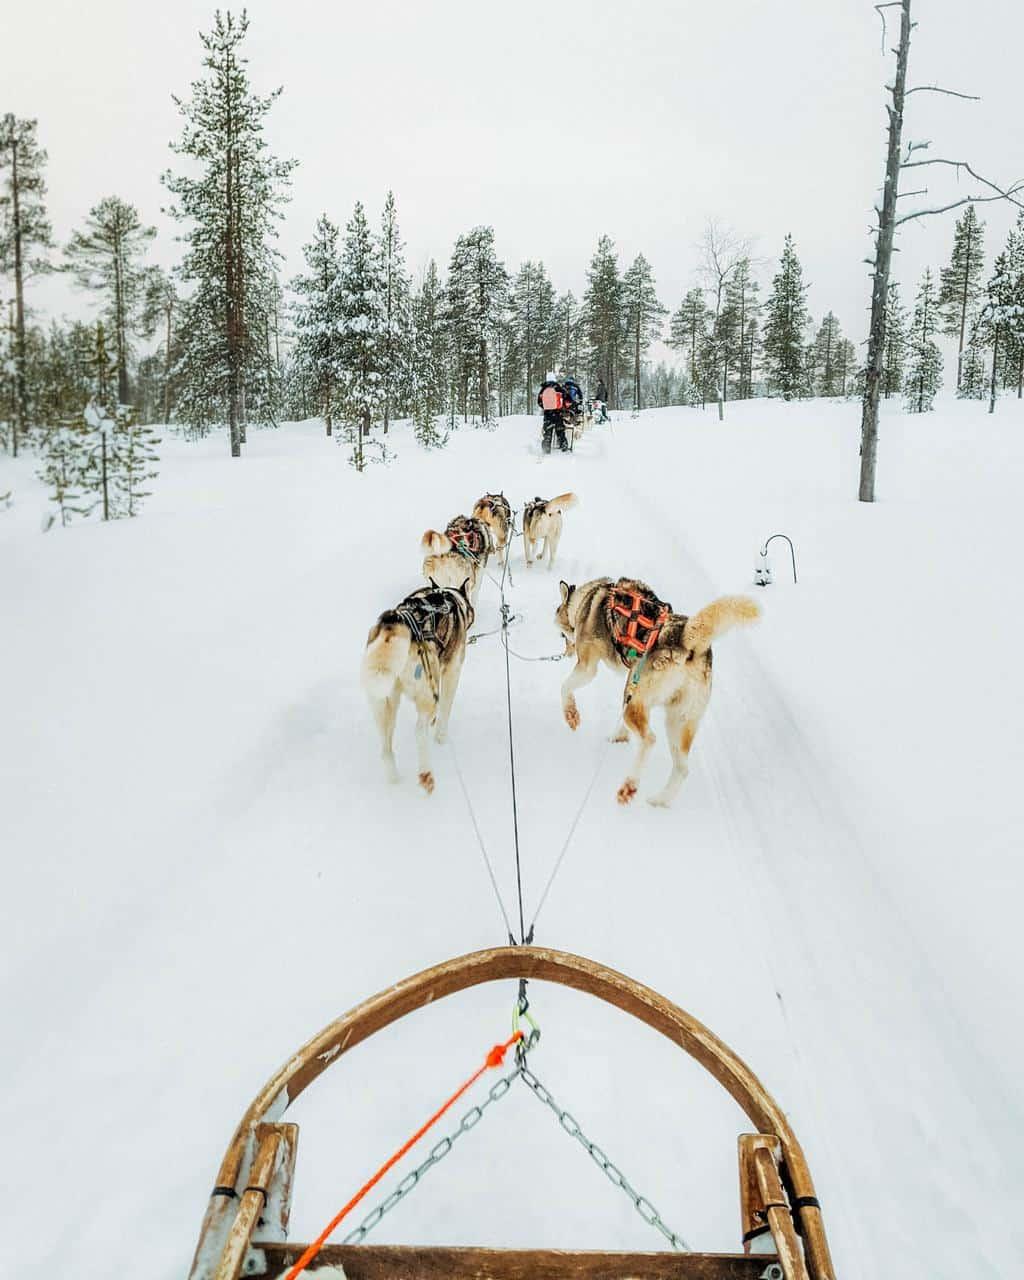 Husky sledding Finnish Lapland, Lapland destinations, Lapland Finland, Inghams